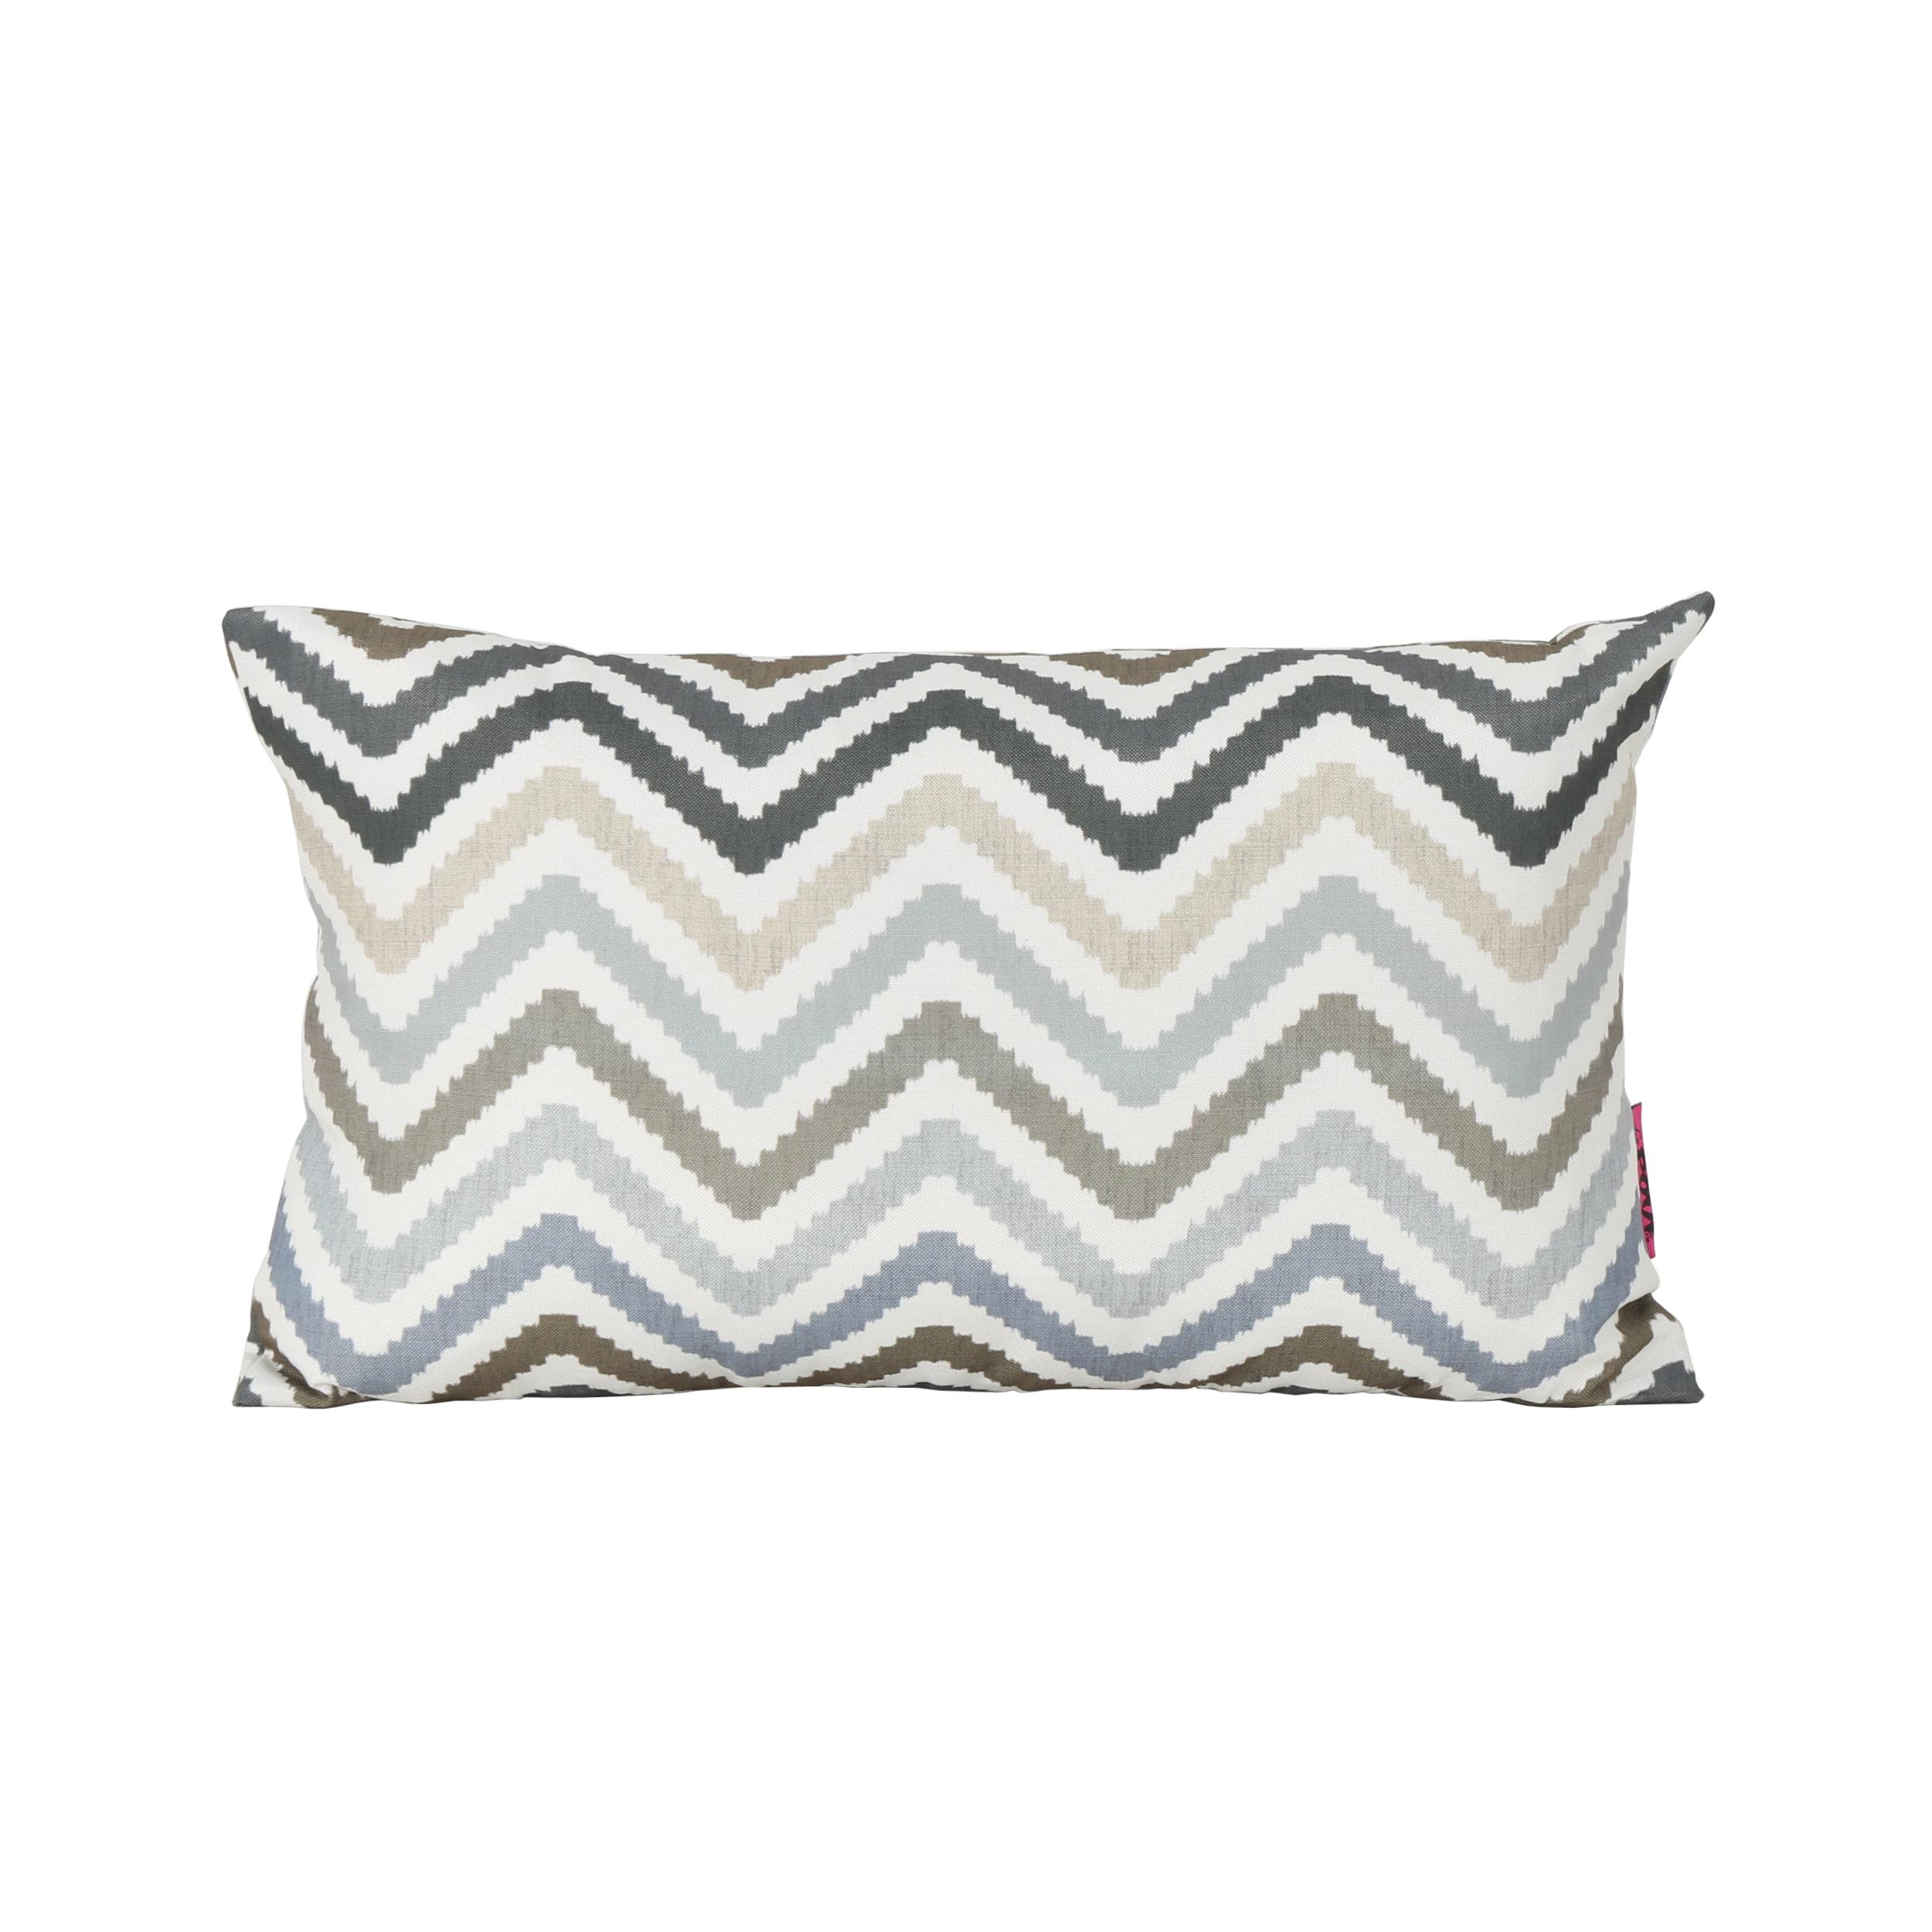 Callon Indoor Water Resistant Rectangular Throw Pillow, Grey, Blue, and Brown Zig Zag... by GDF Studio